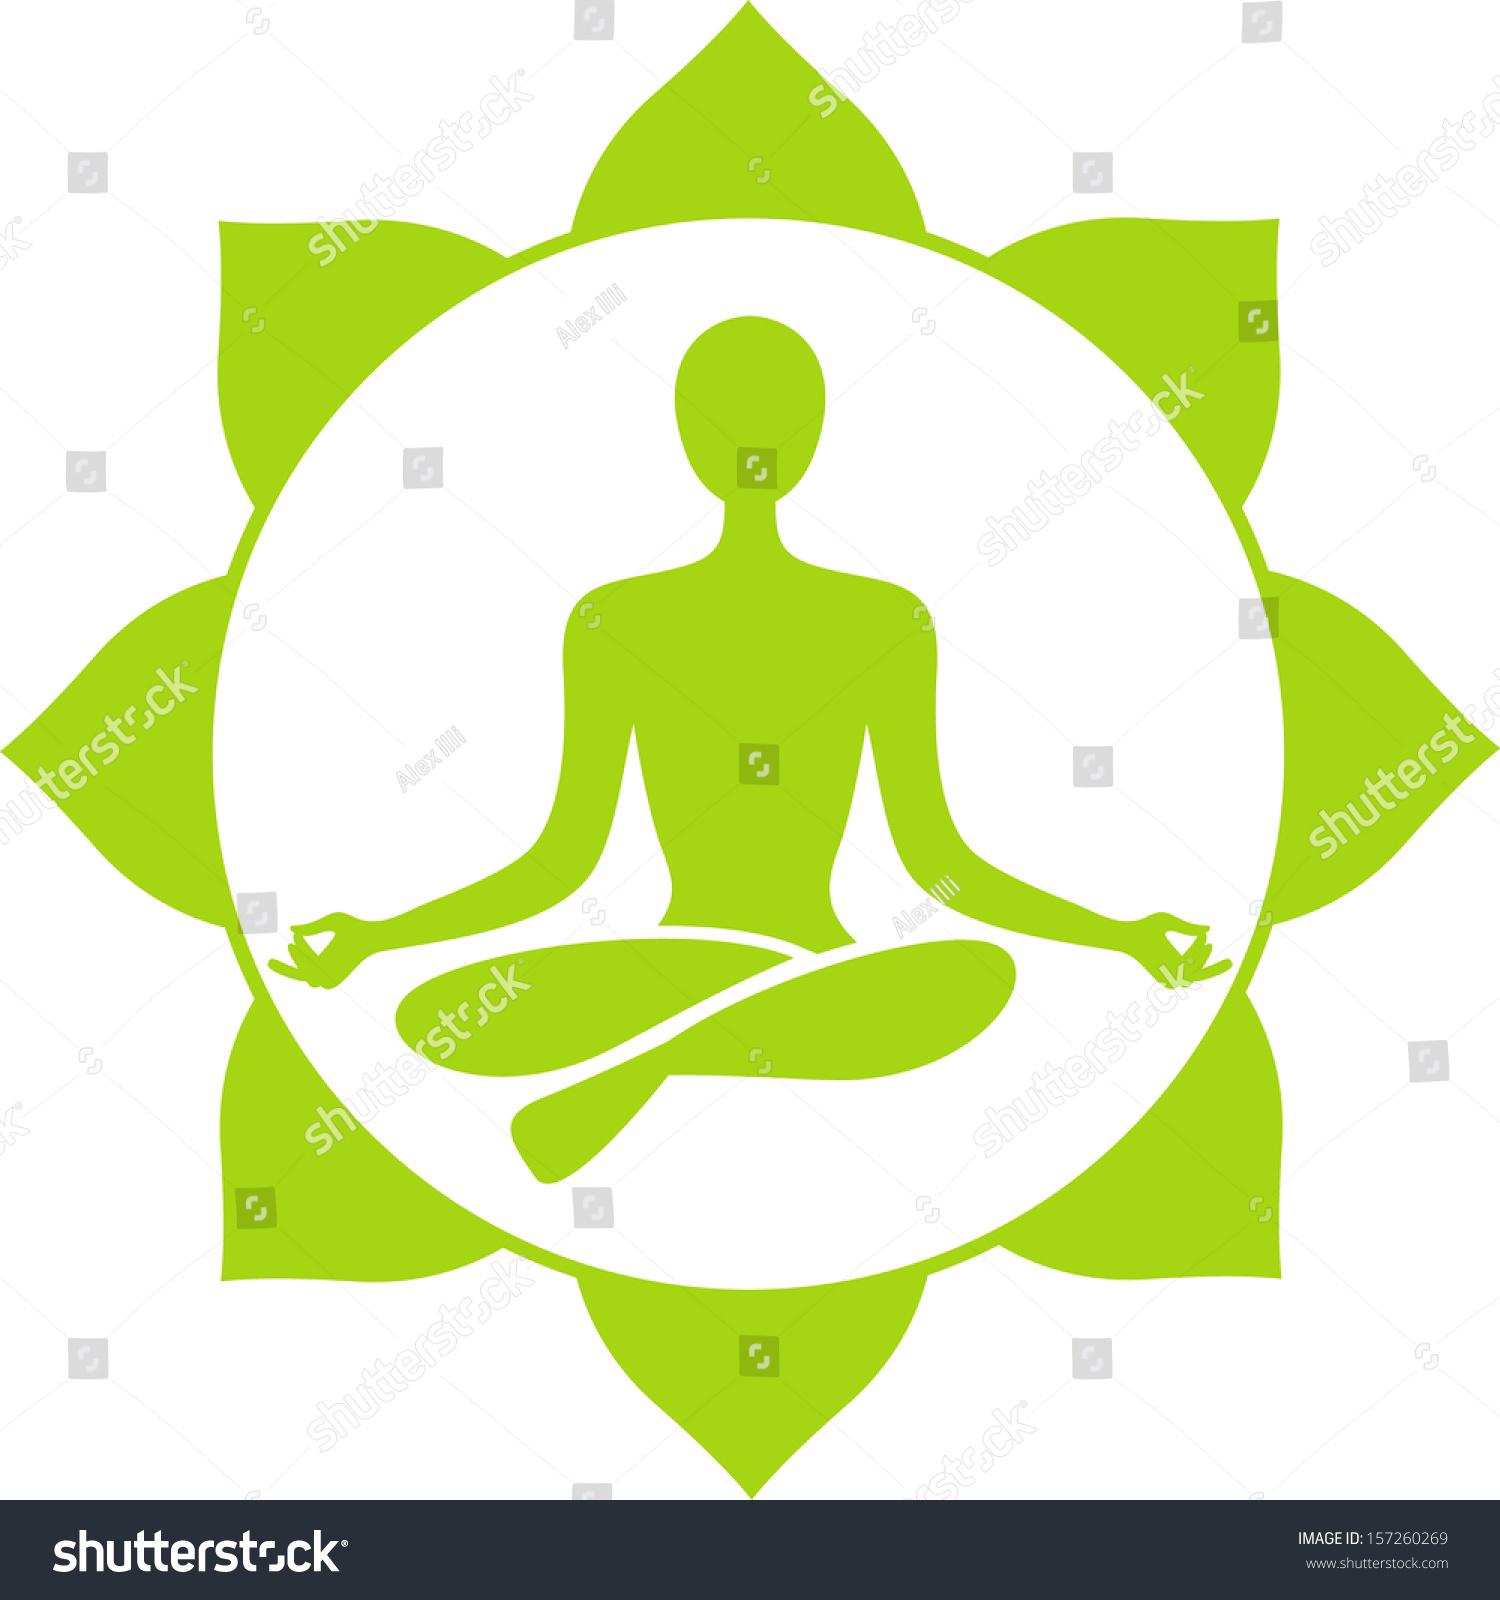 Yoga Symbol Stock Vector 157260269 - Shutterstock